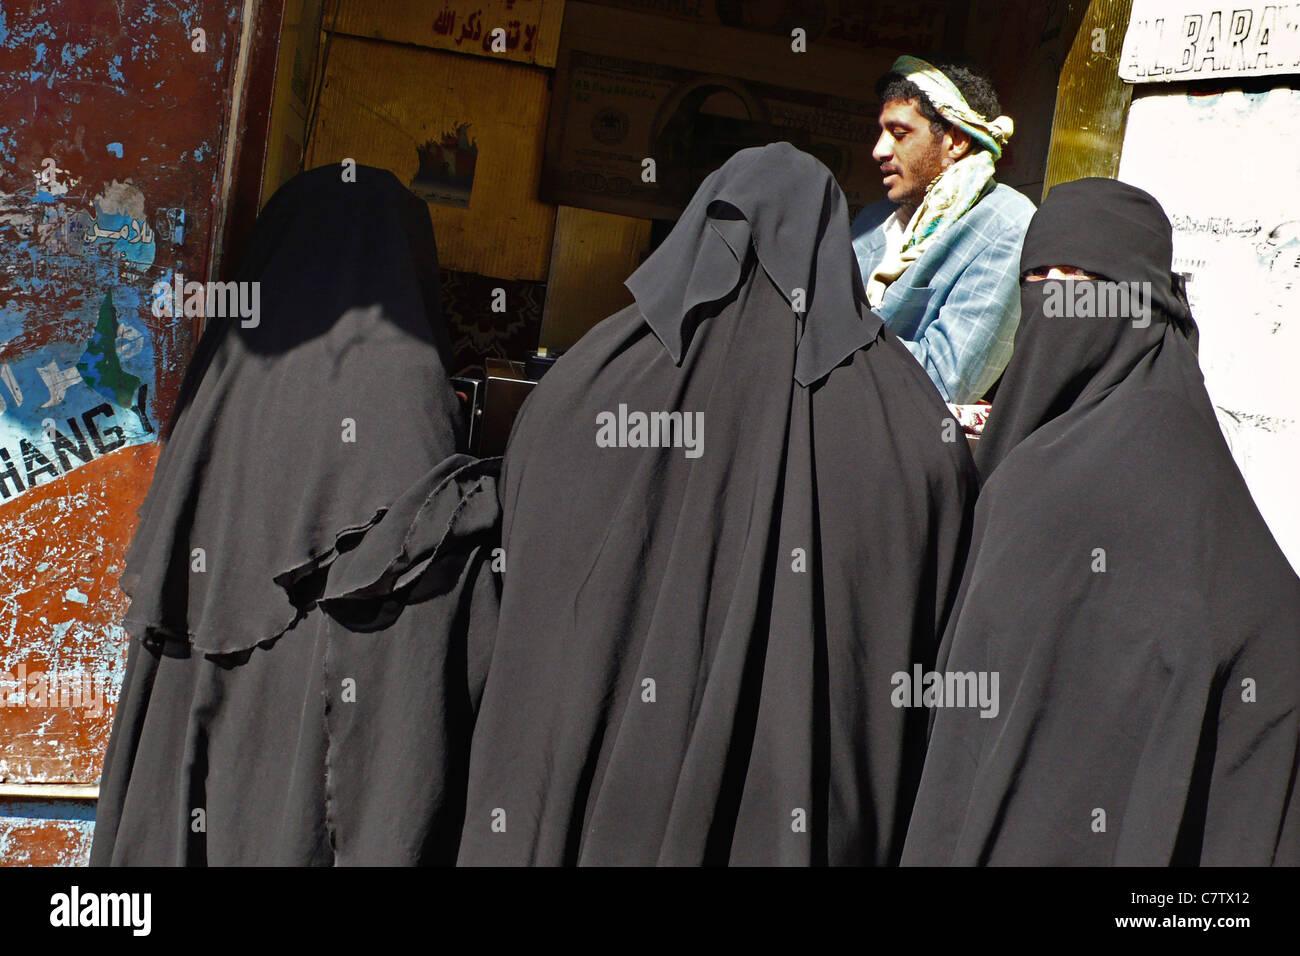 Yemen, Sanaa, veiled women at market - Stock Image